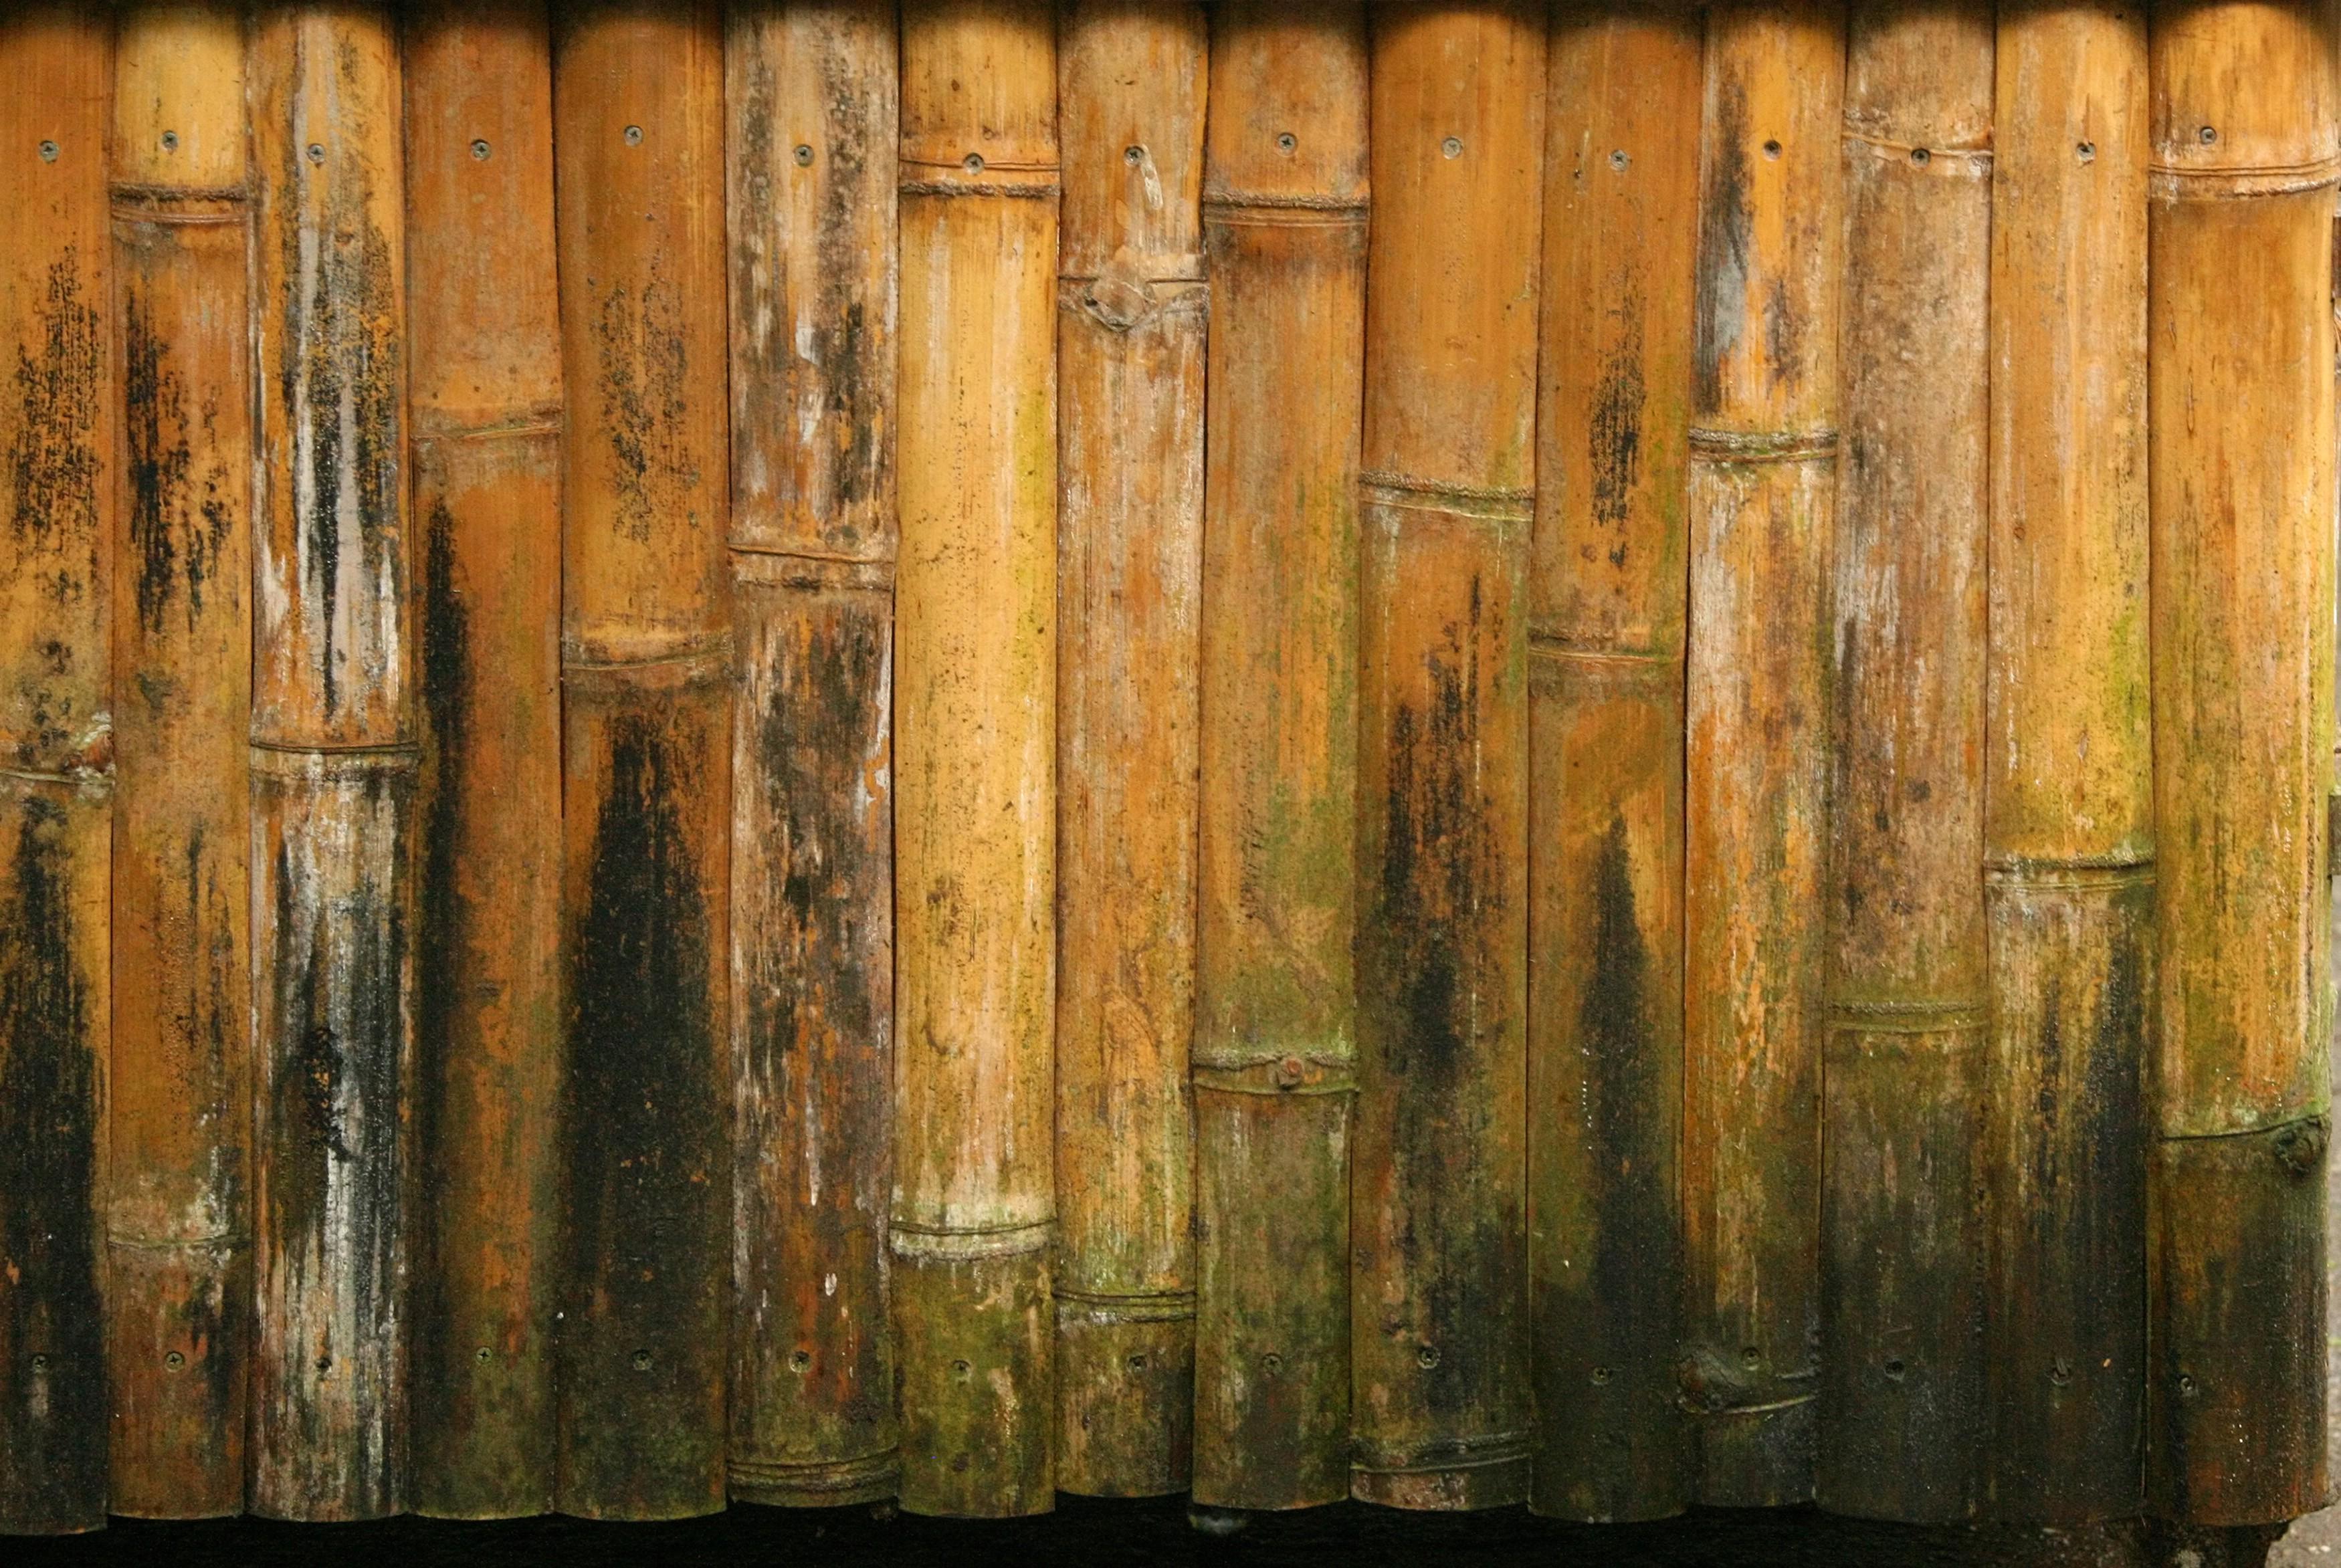 Кора дерева текстура коры дерева